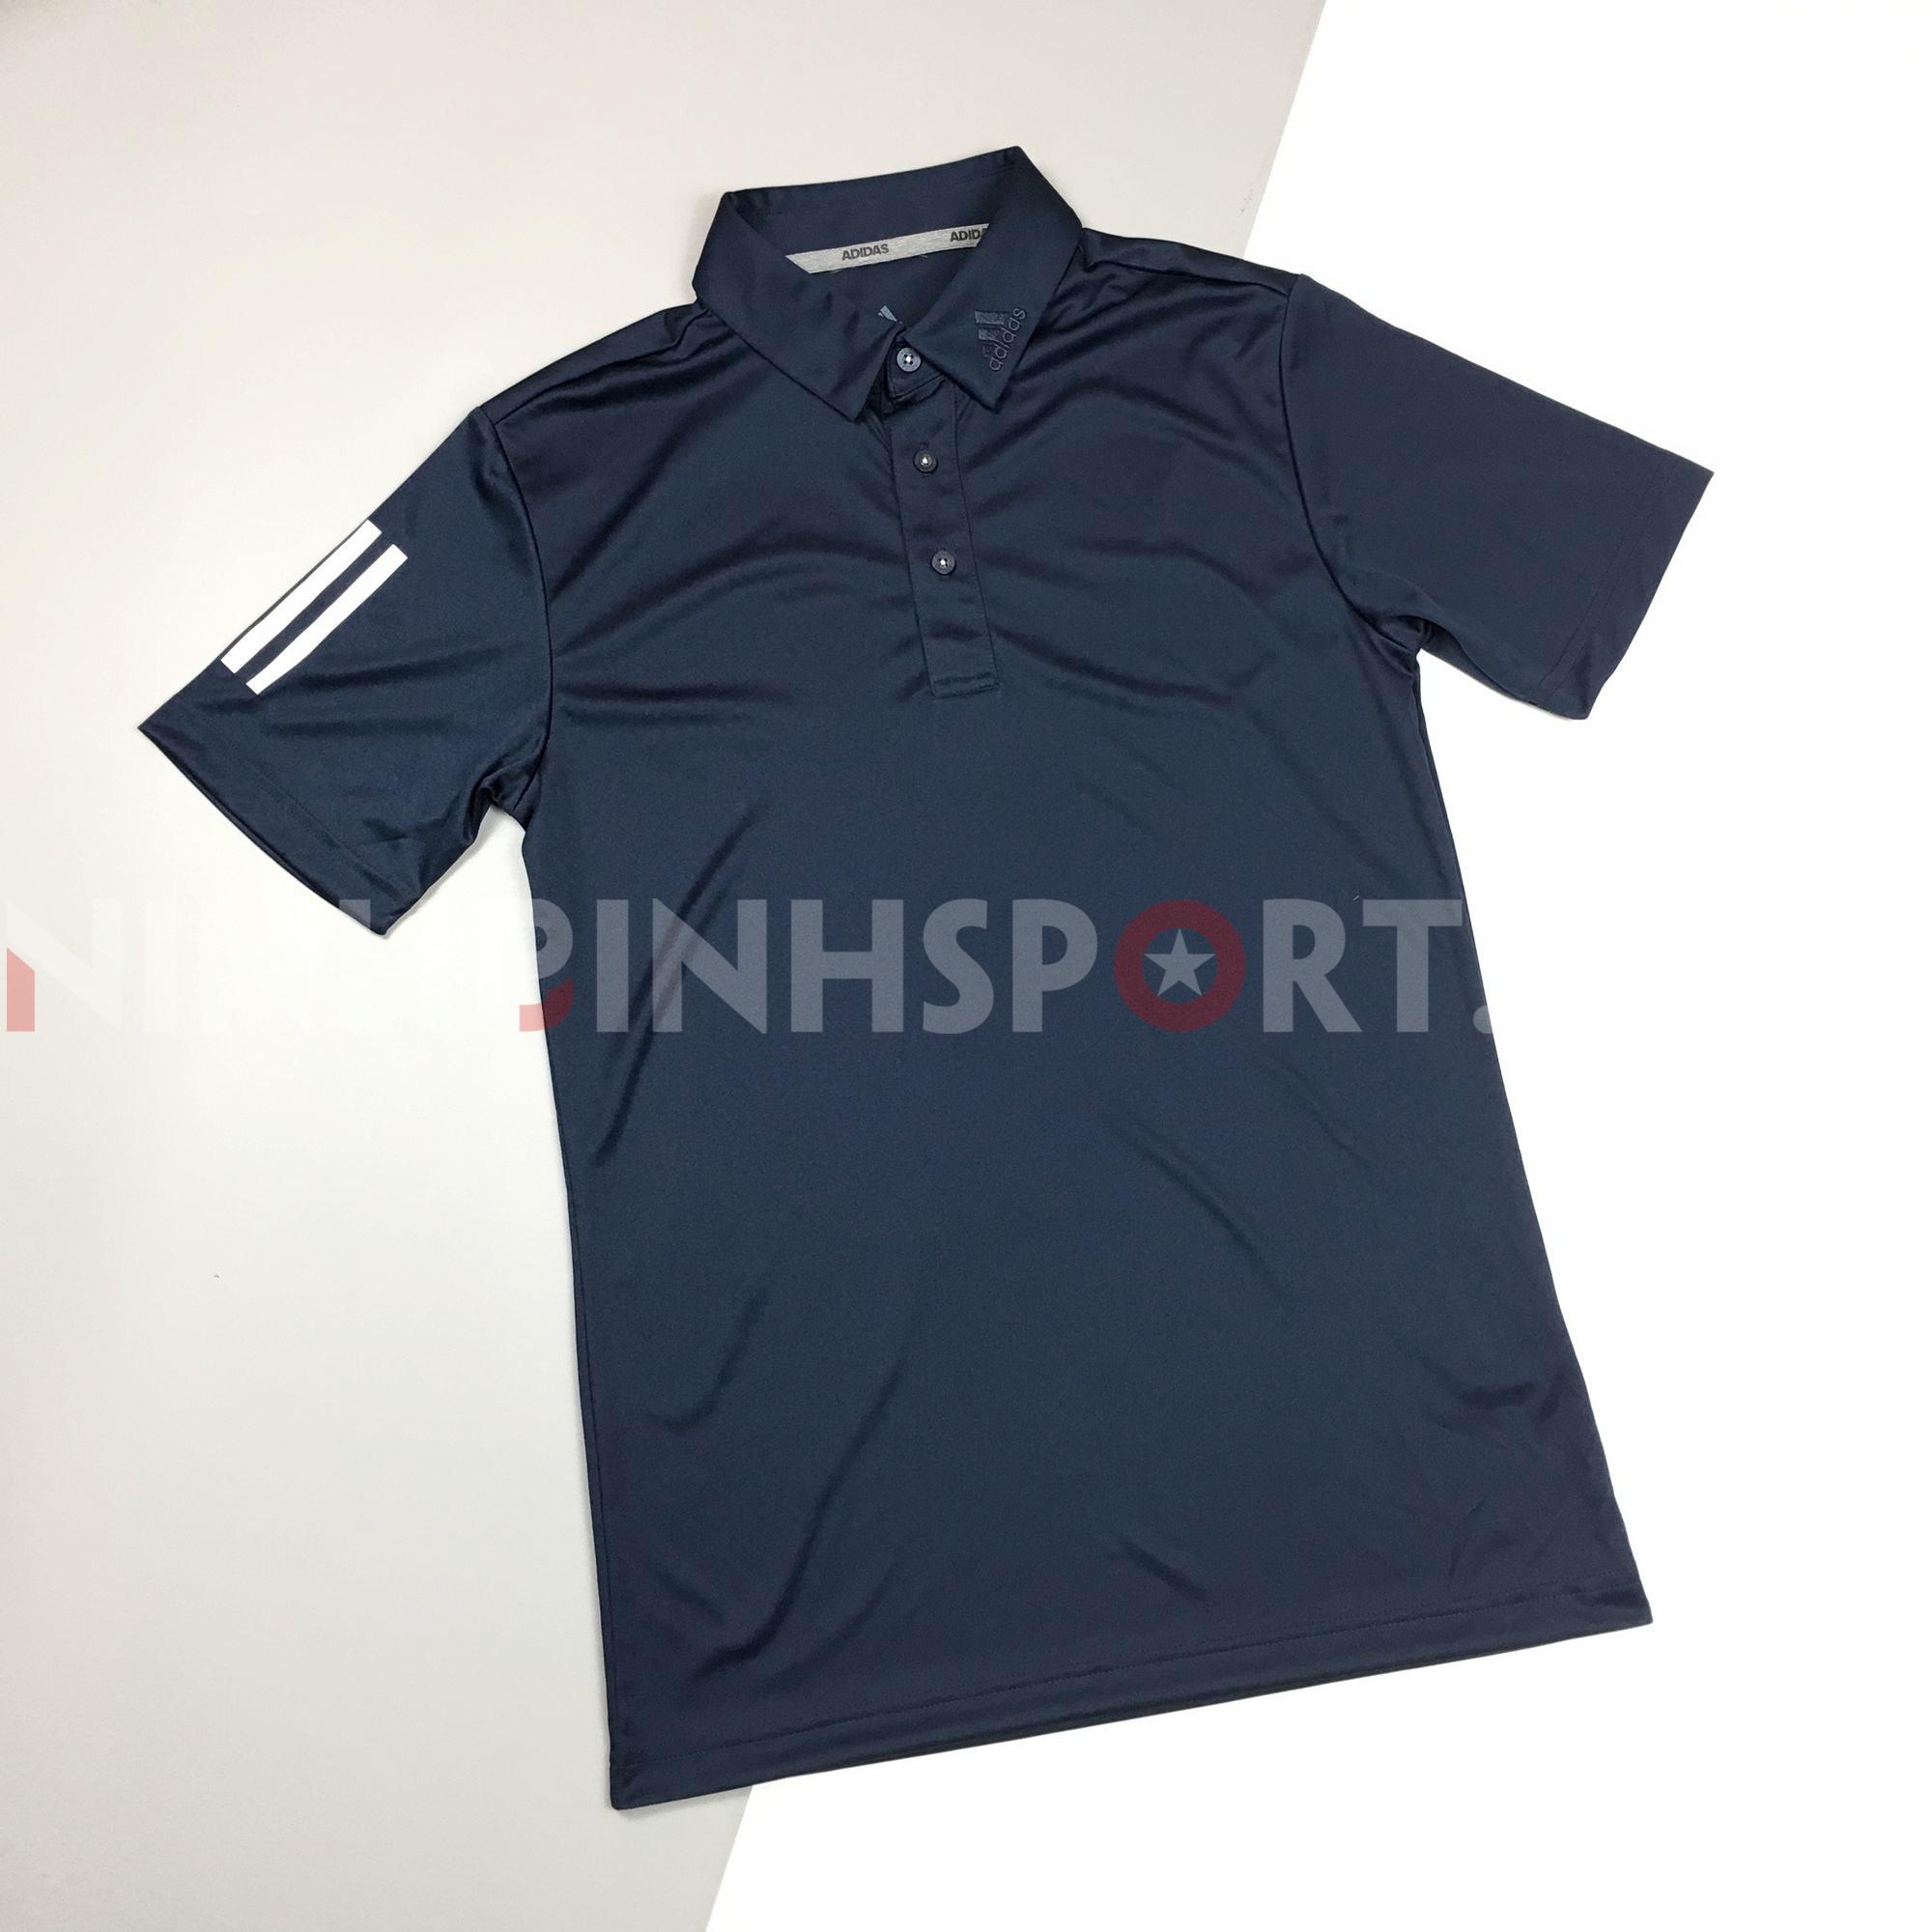 Áo thể thao nam Adidas Golf Polo - Blue DW5750